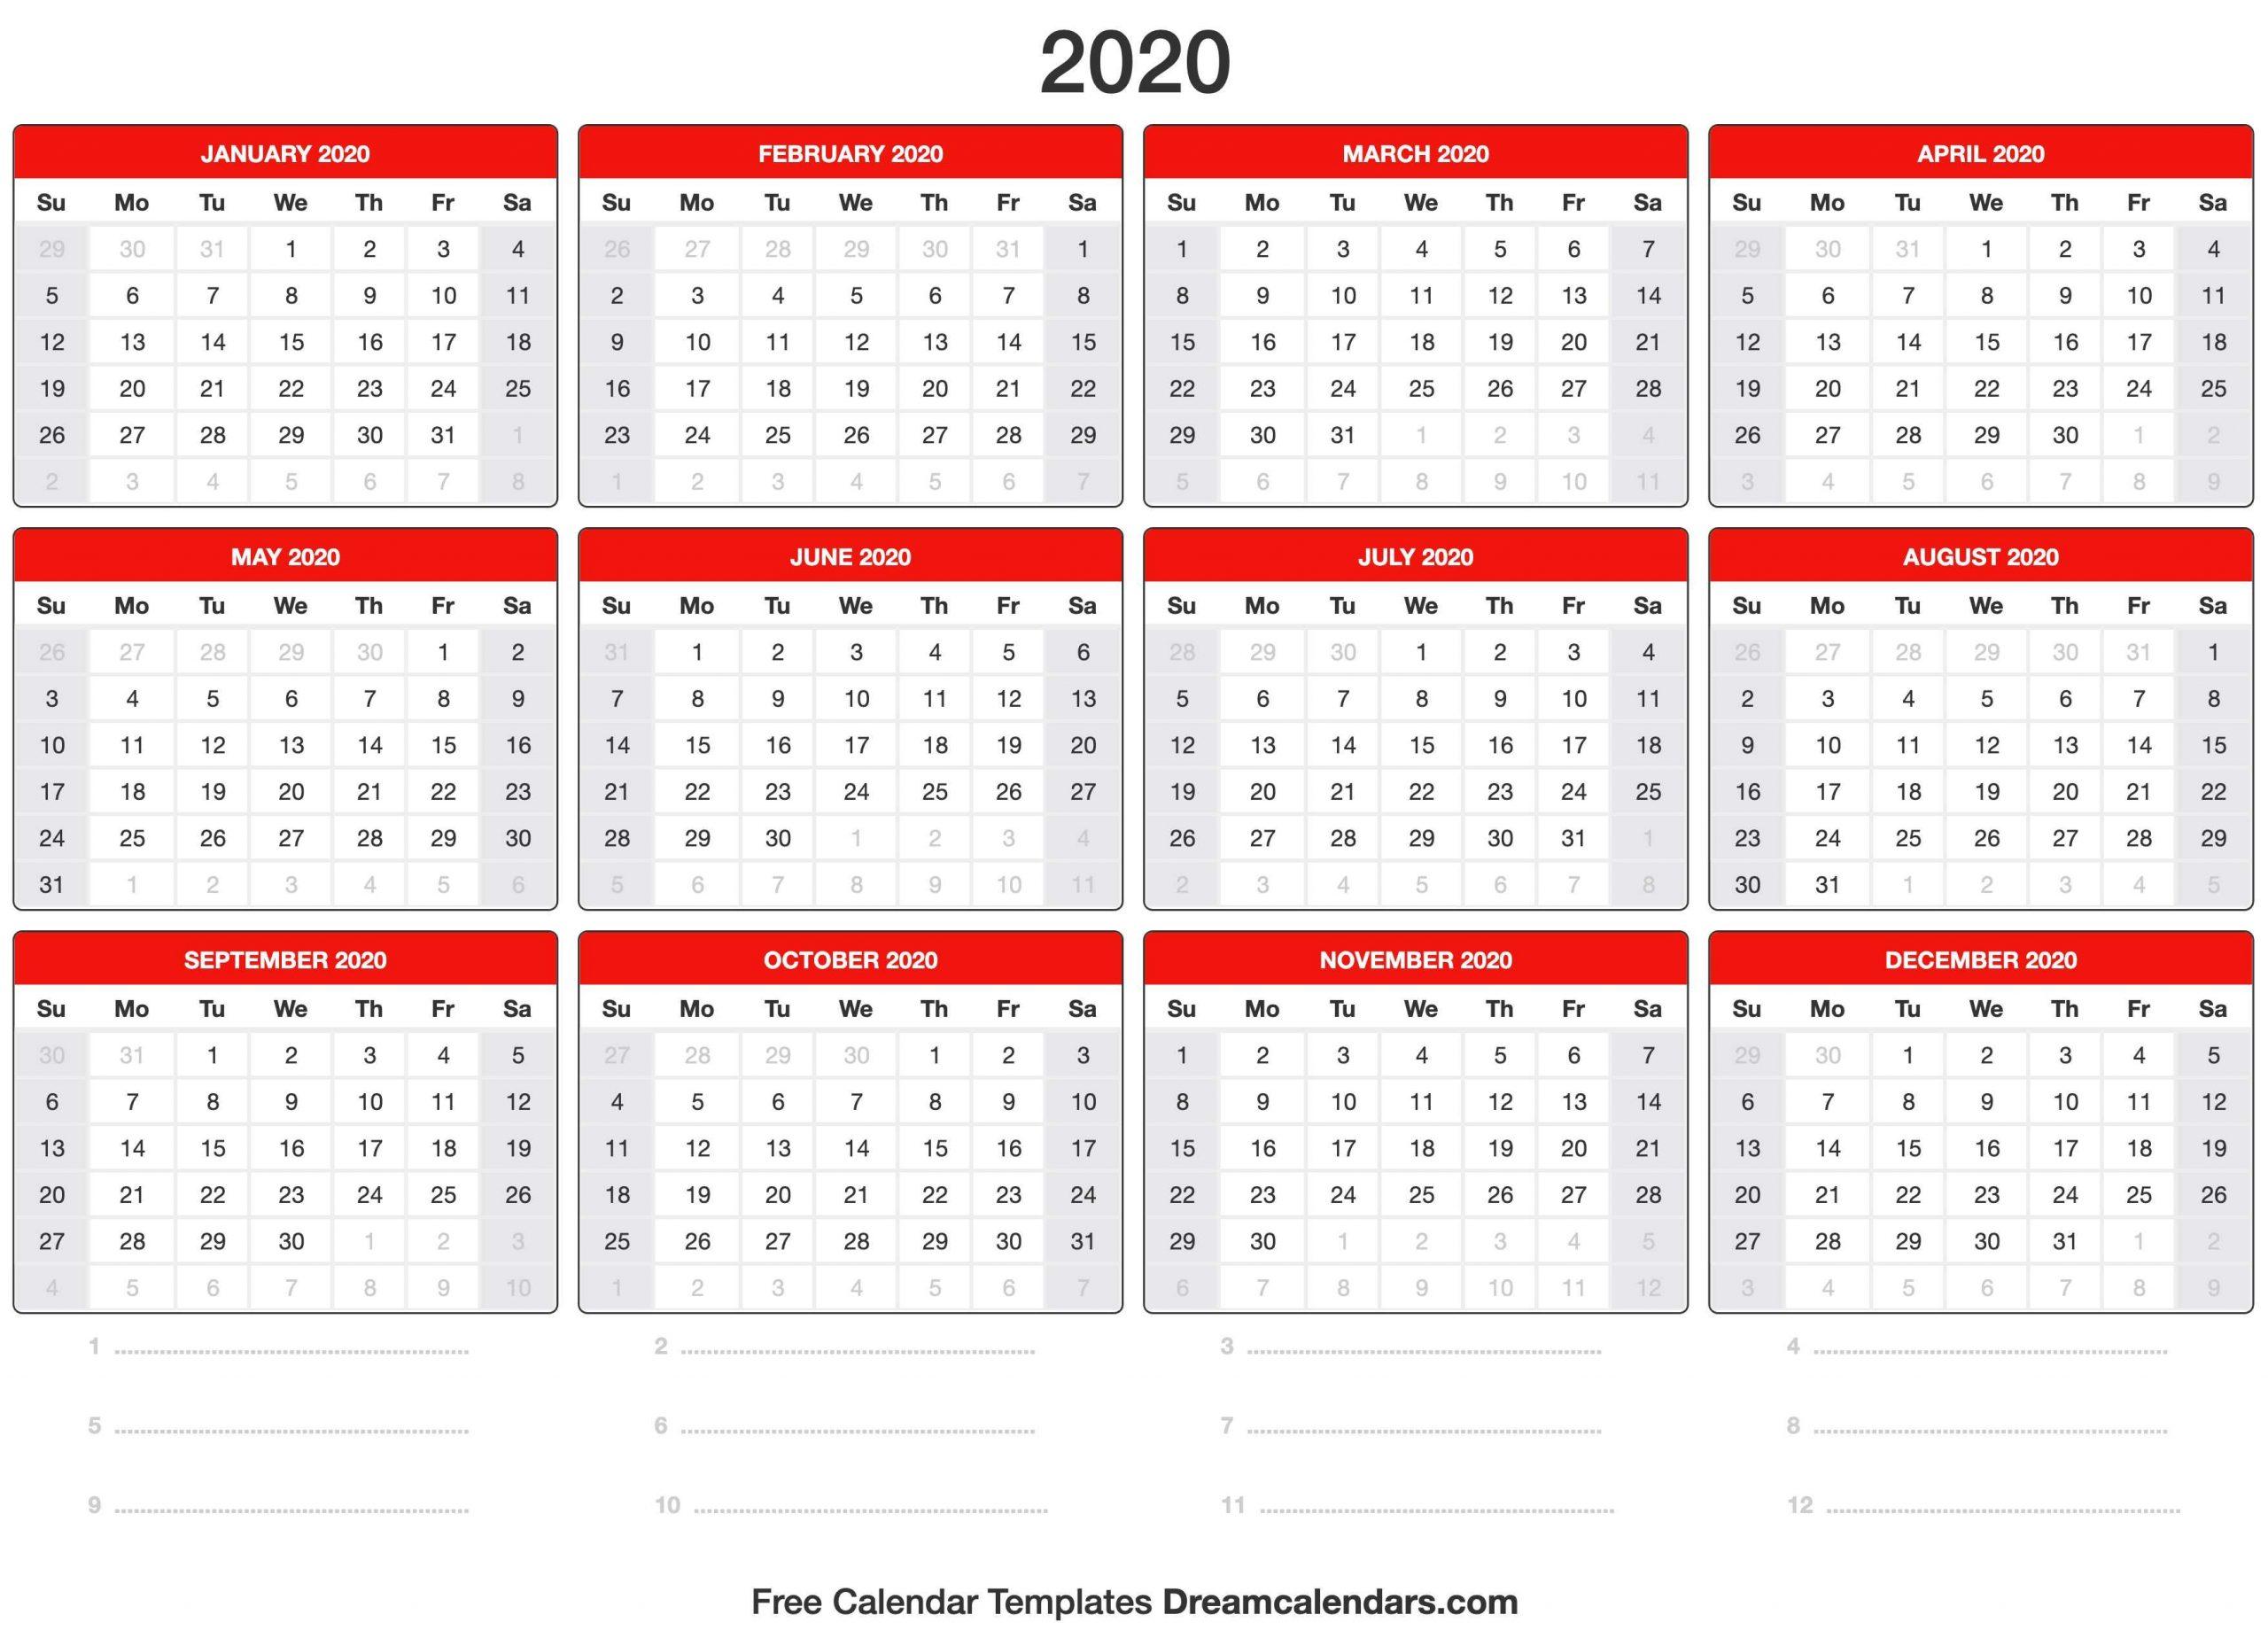 Dream Calendars – Make Your Calendar Template Blog Free 2020 Calendar With Days Counted 1 365